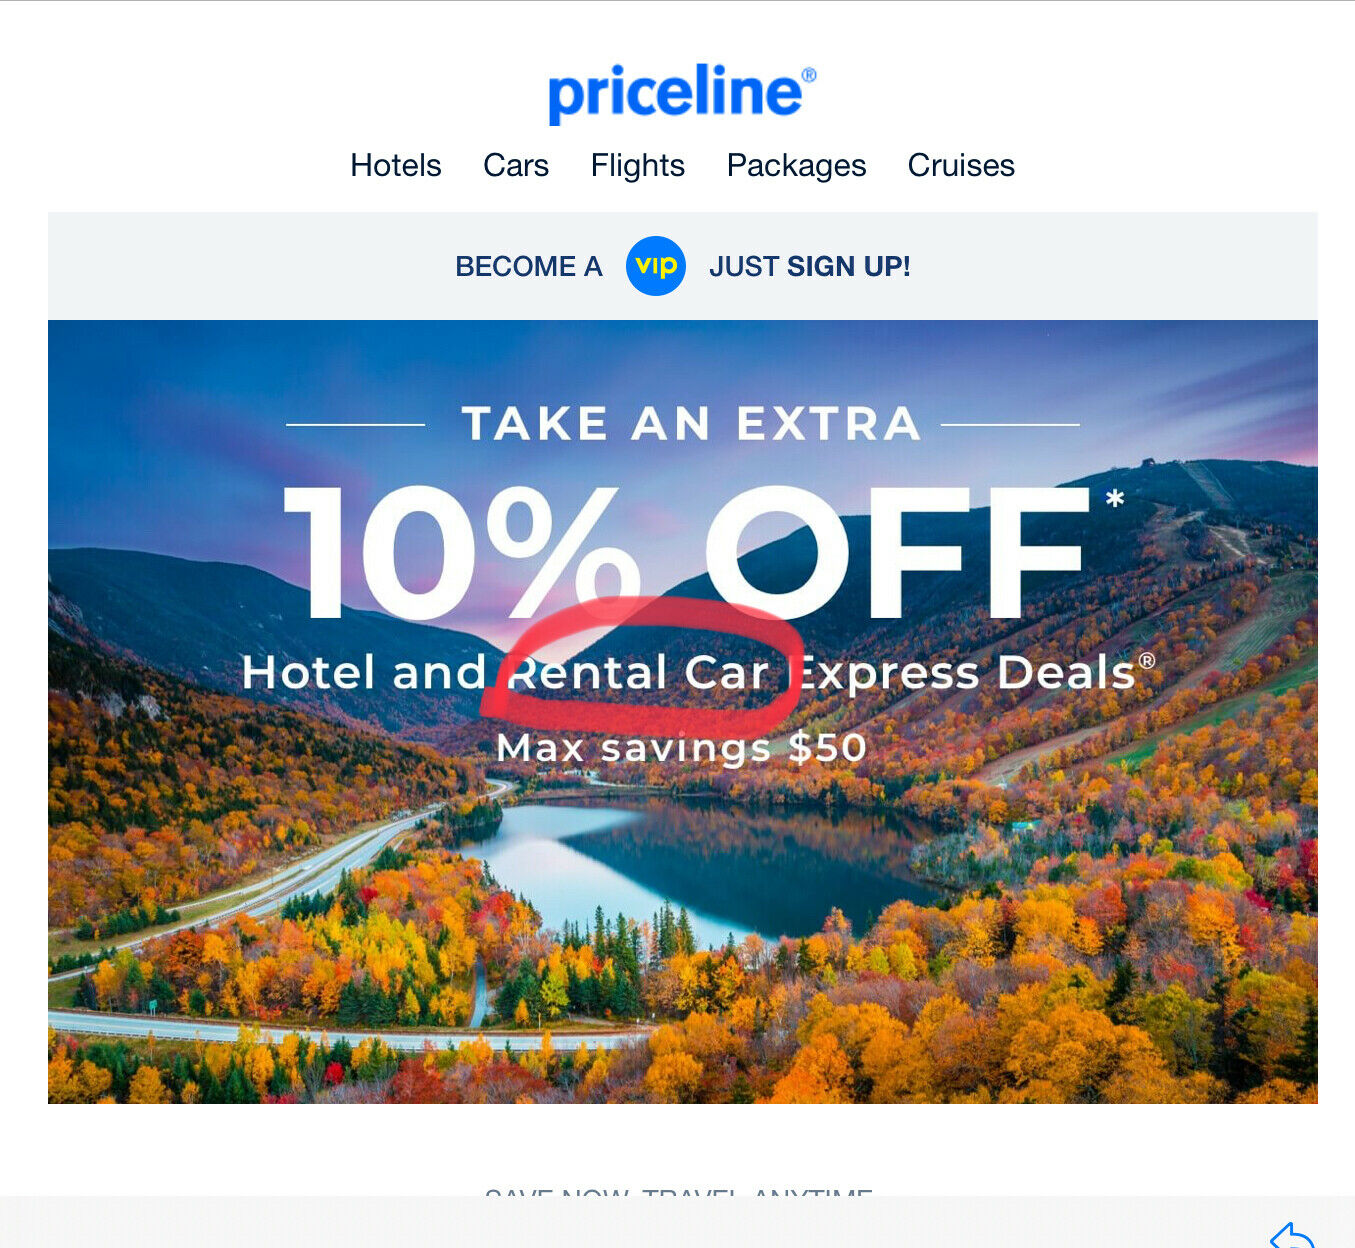 Priceline.com Coupon-10 Off Hotel/ Rental CAR Express Deals Exp.10/16 Max. 50 - $3.95